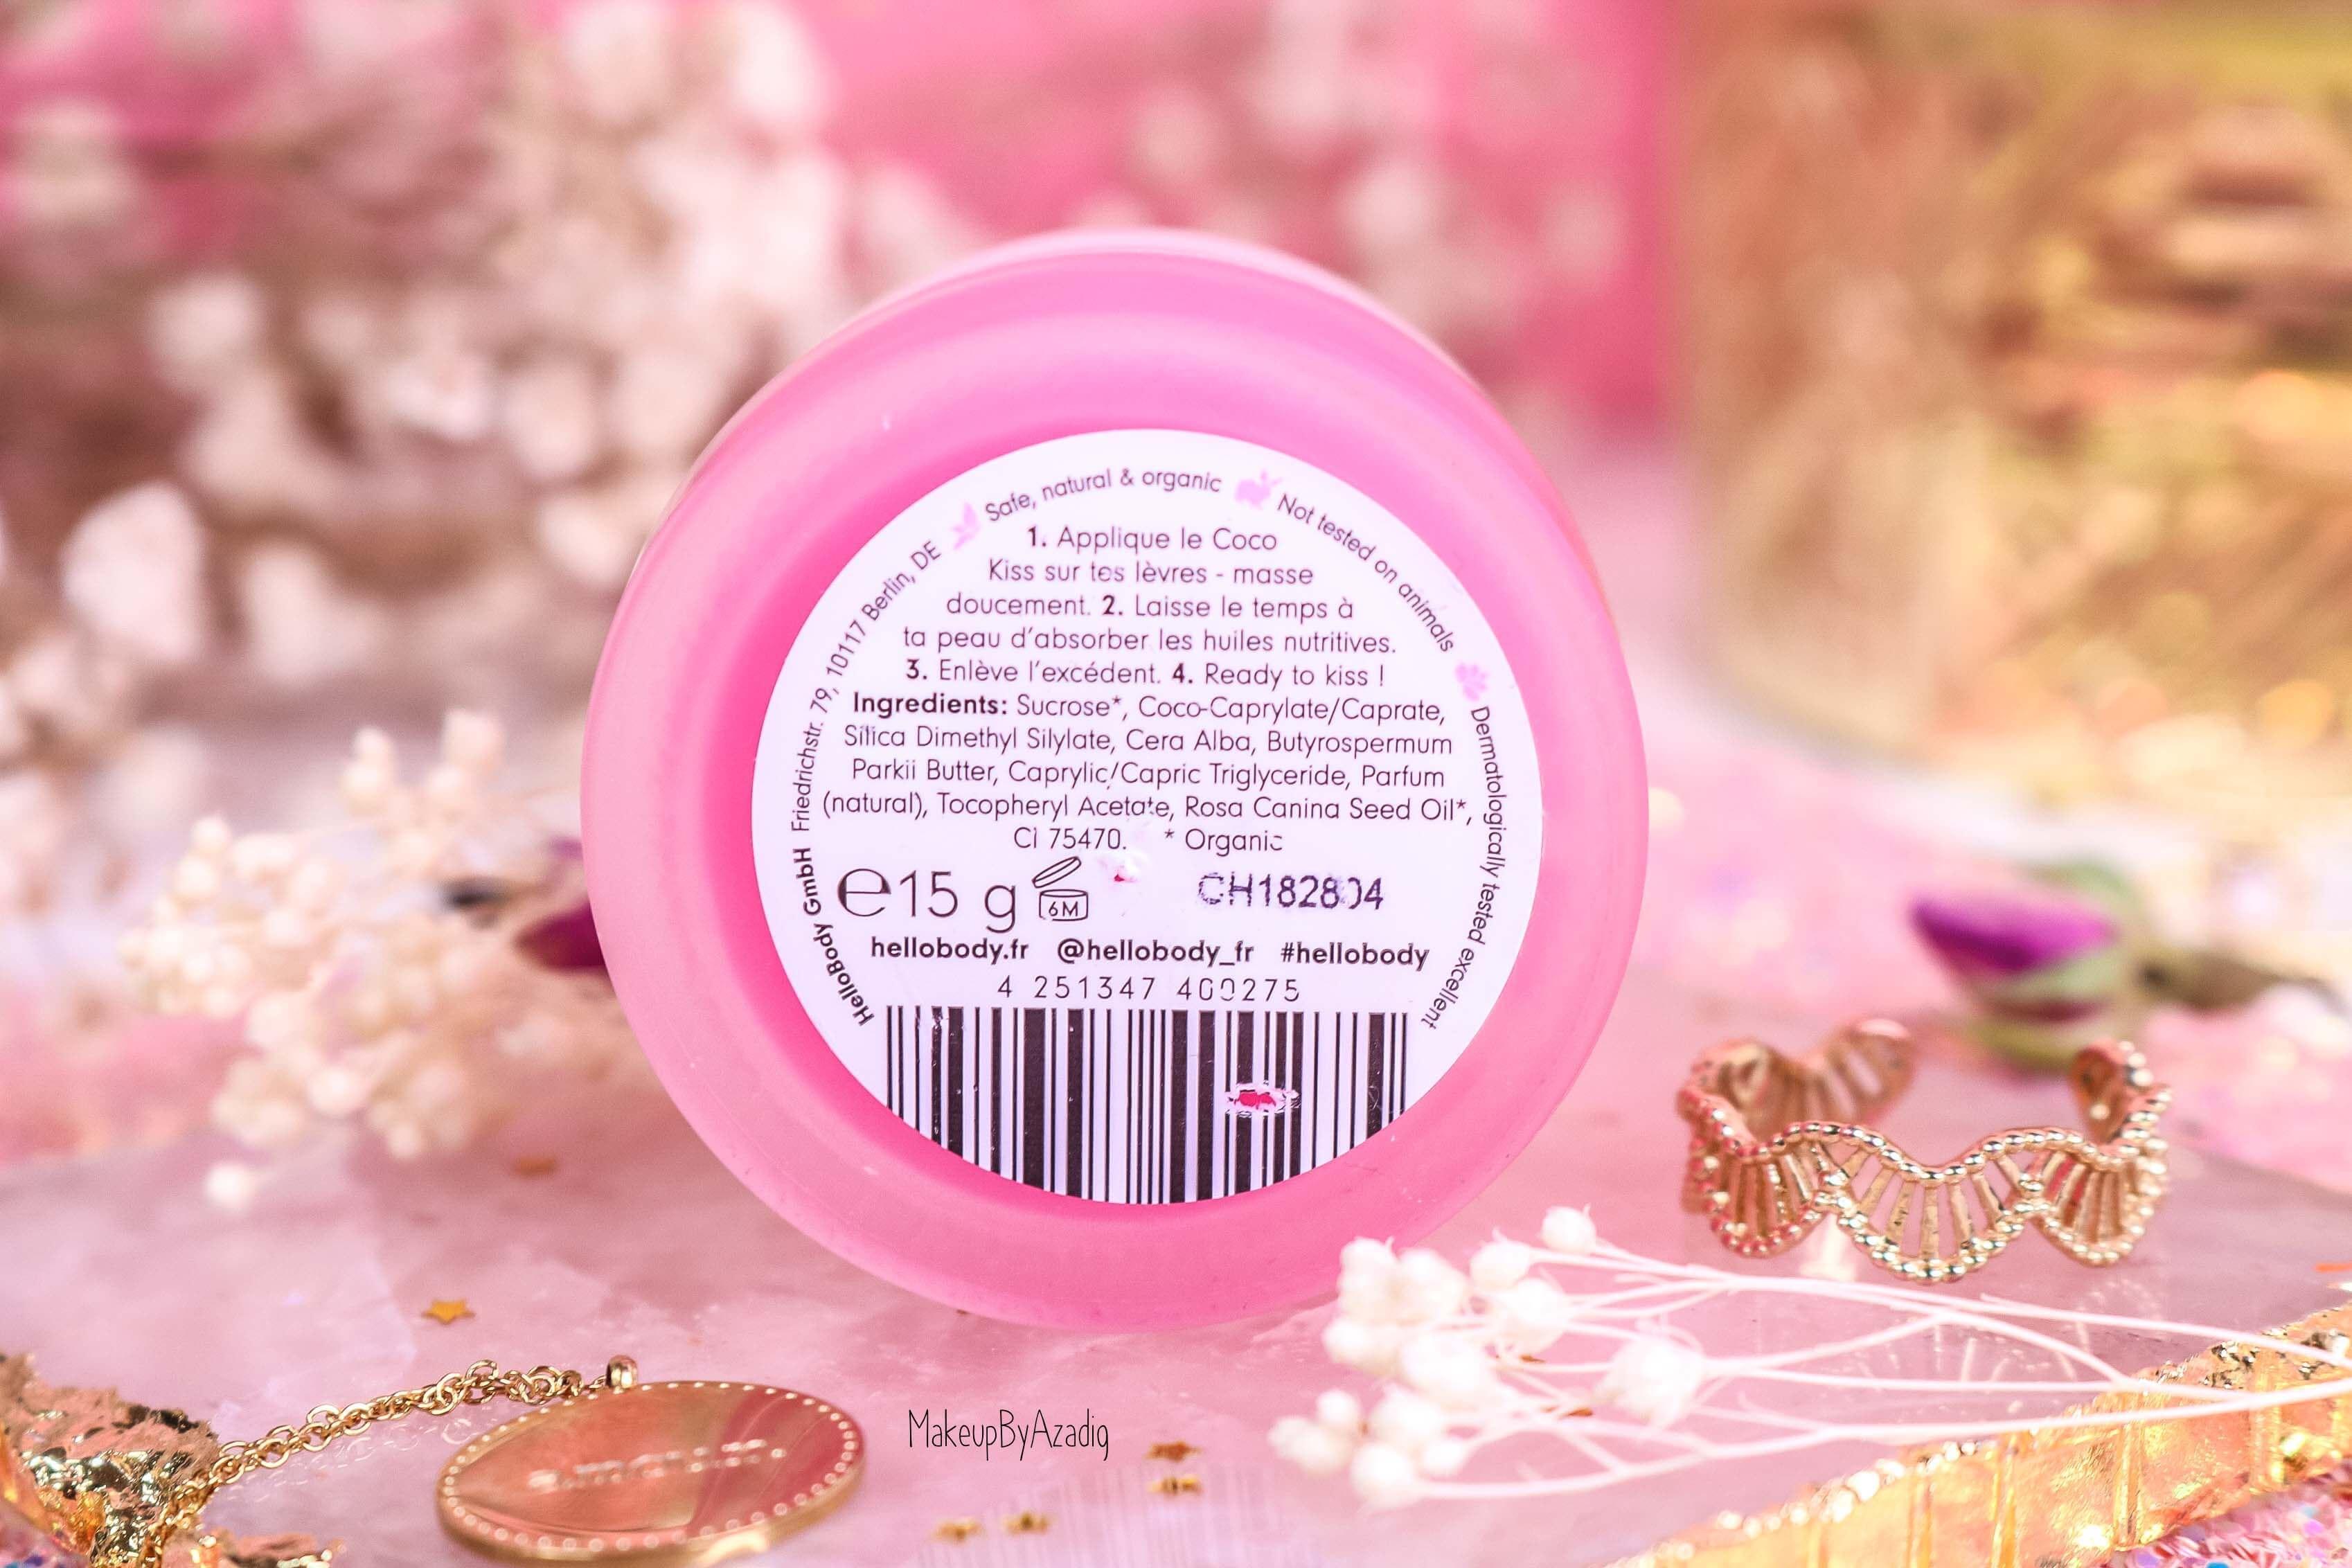 revue-baume-gommage-levres-coco-kiss-hellobody-avis-prix-swatch-makeupbyazadig-efficacite-lip-scrub-ingredients